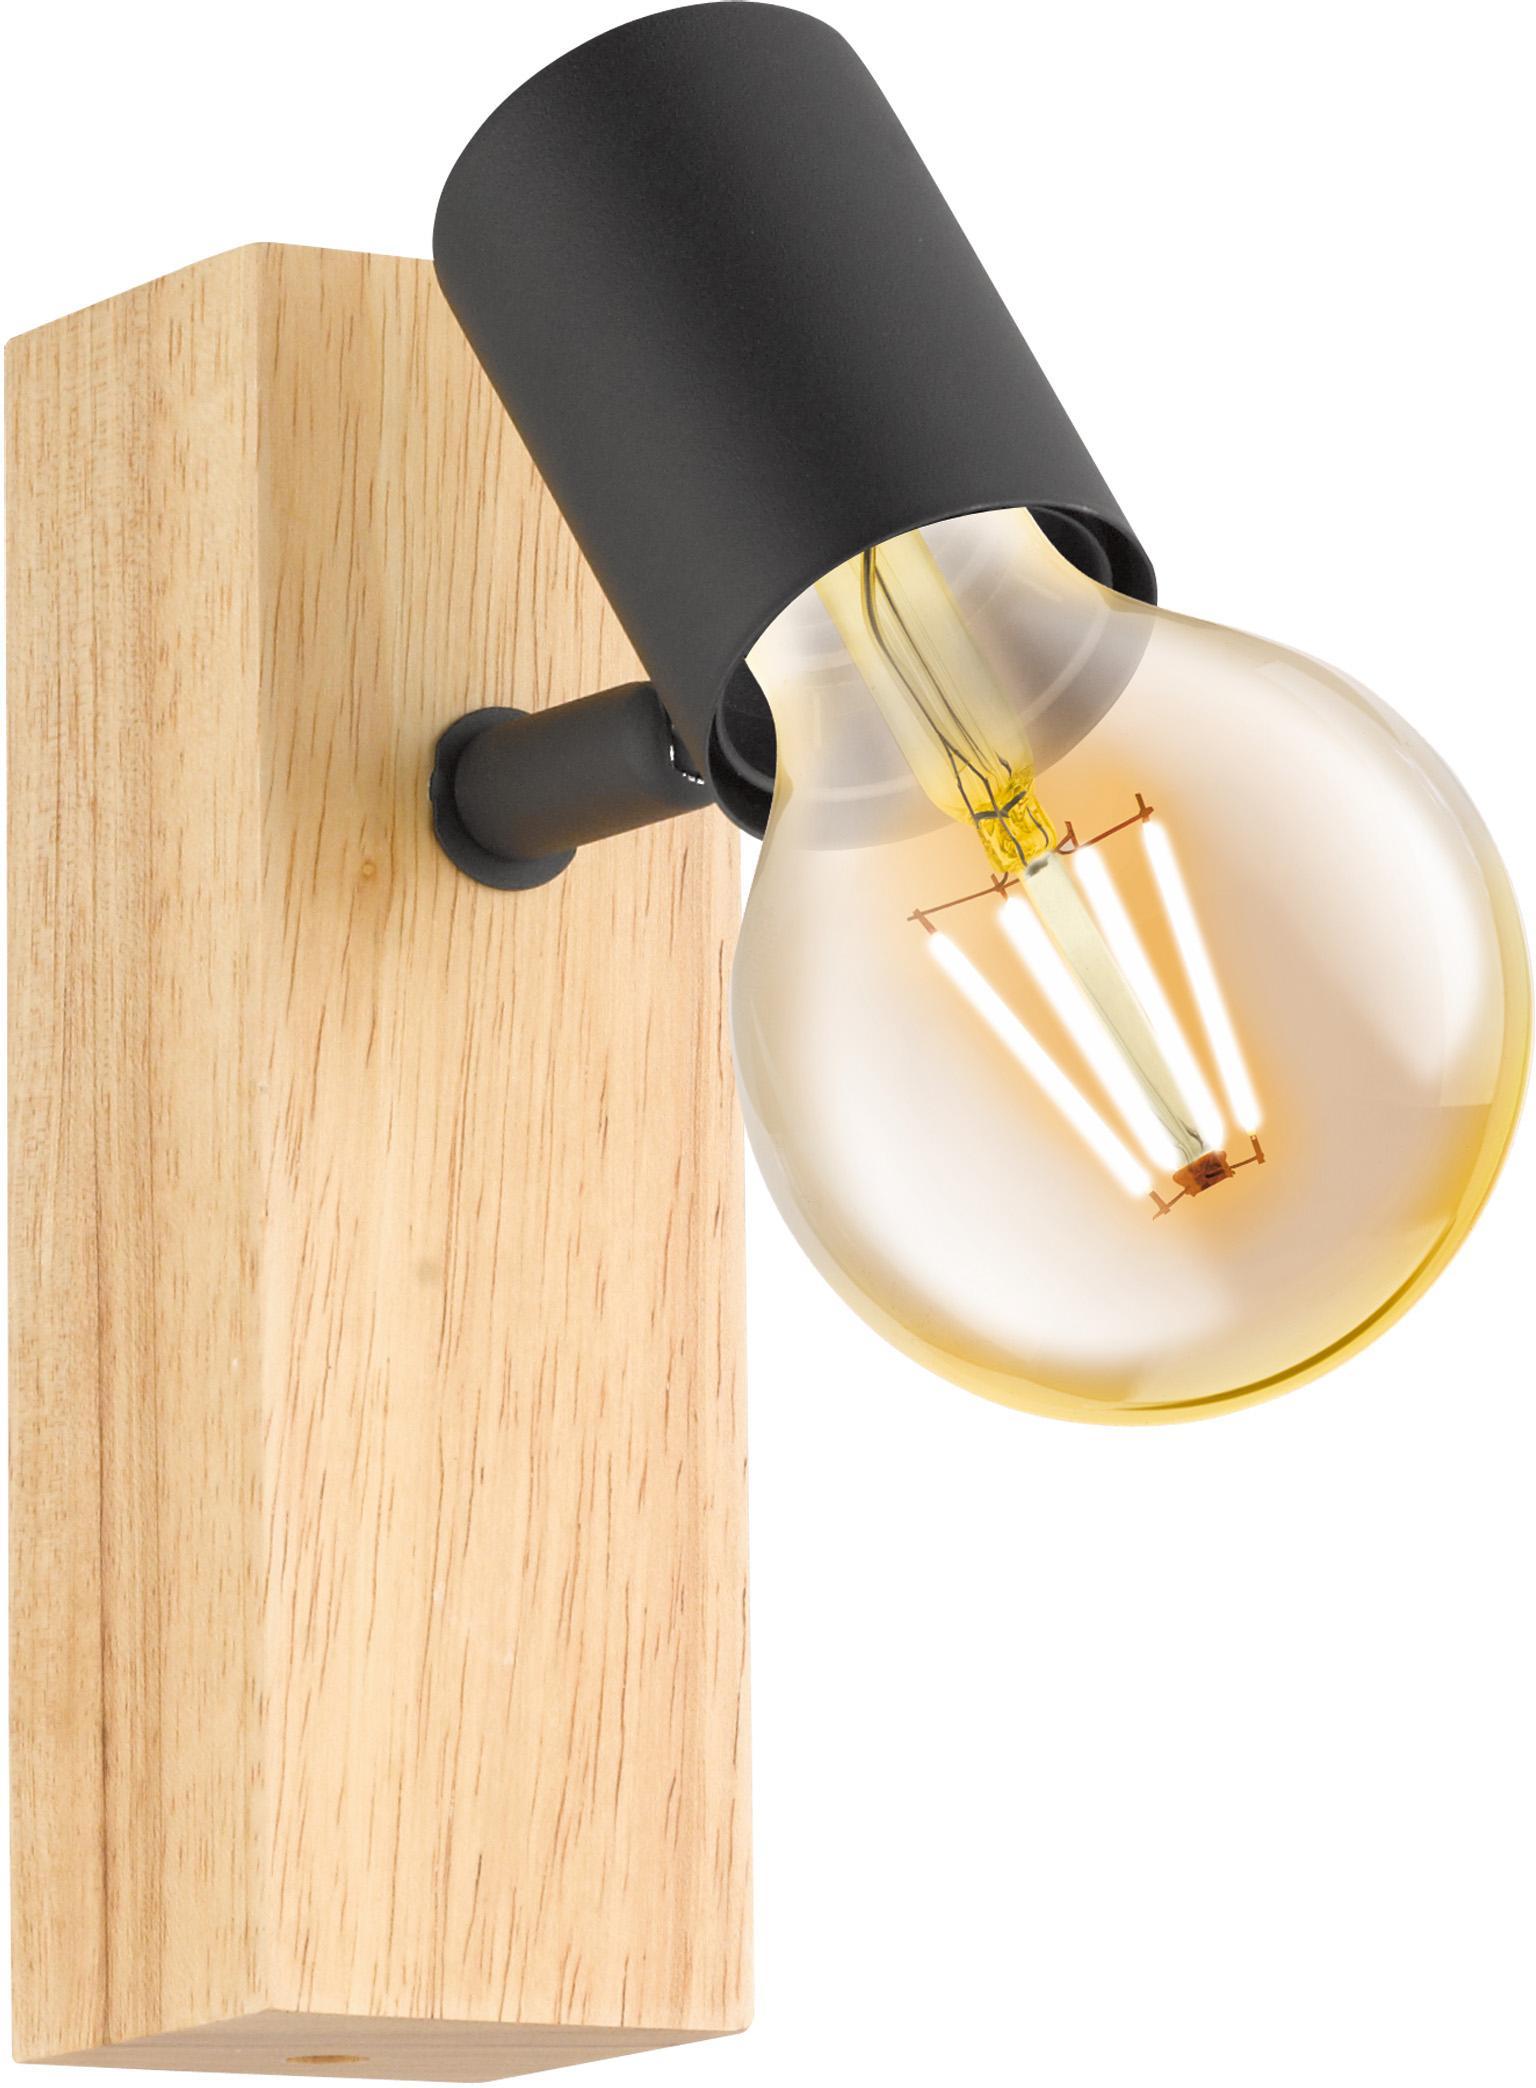 Wandlamp Townshend, Fitting: gecoat metaal, Zwart, houtkleurig, 5 x 17 cm